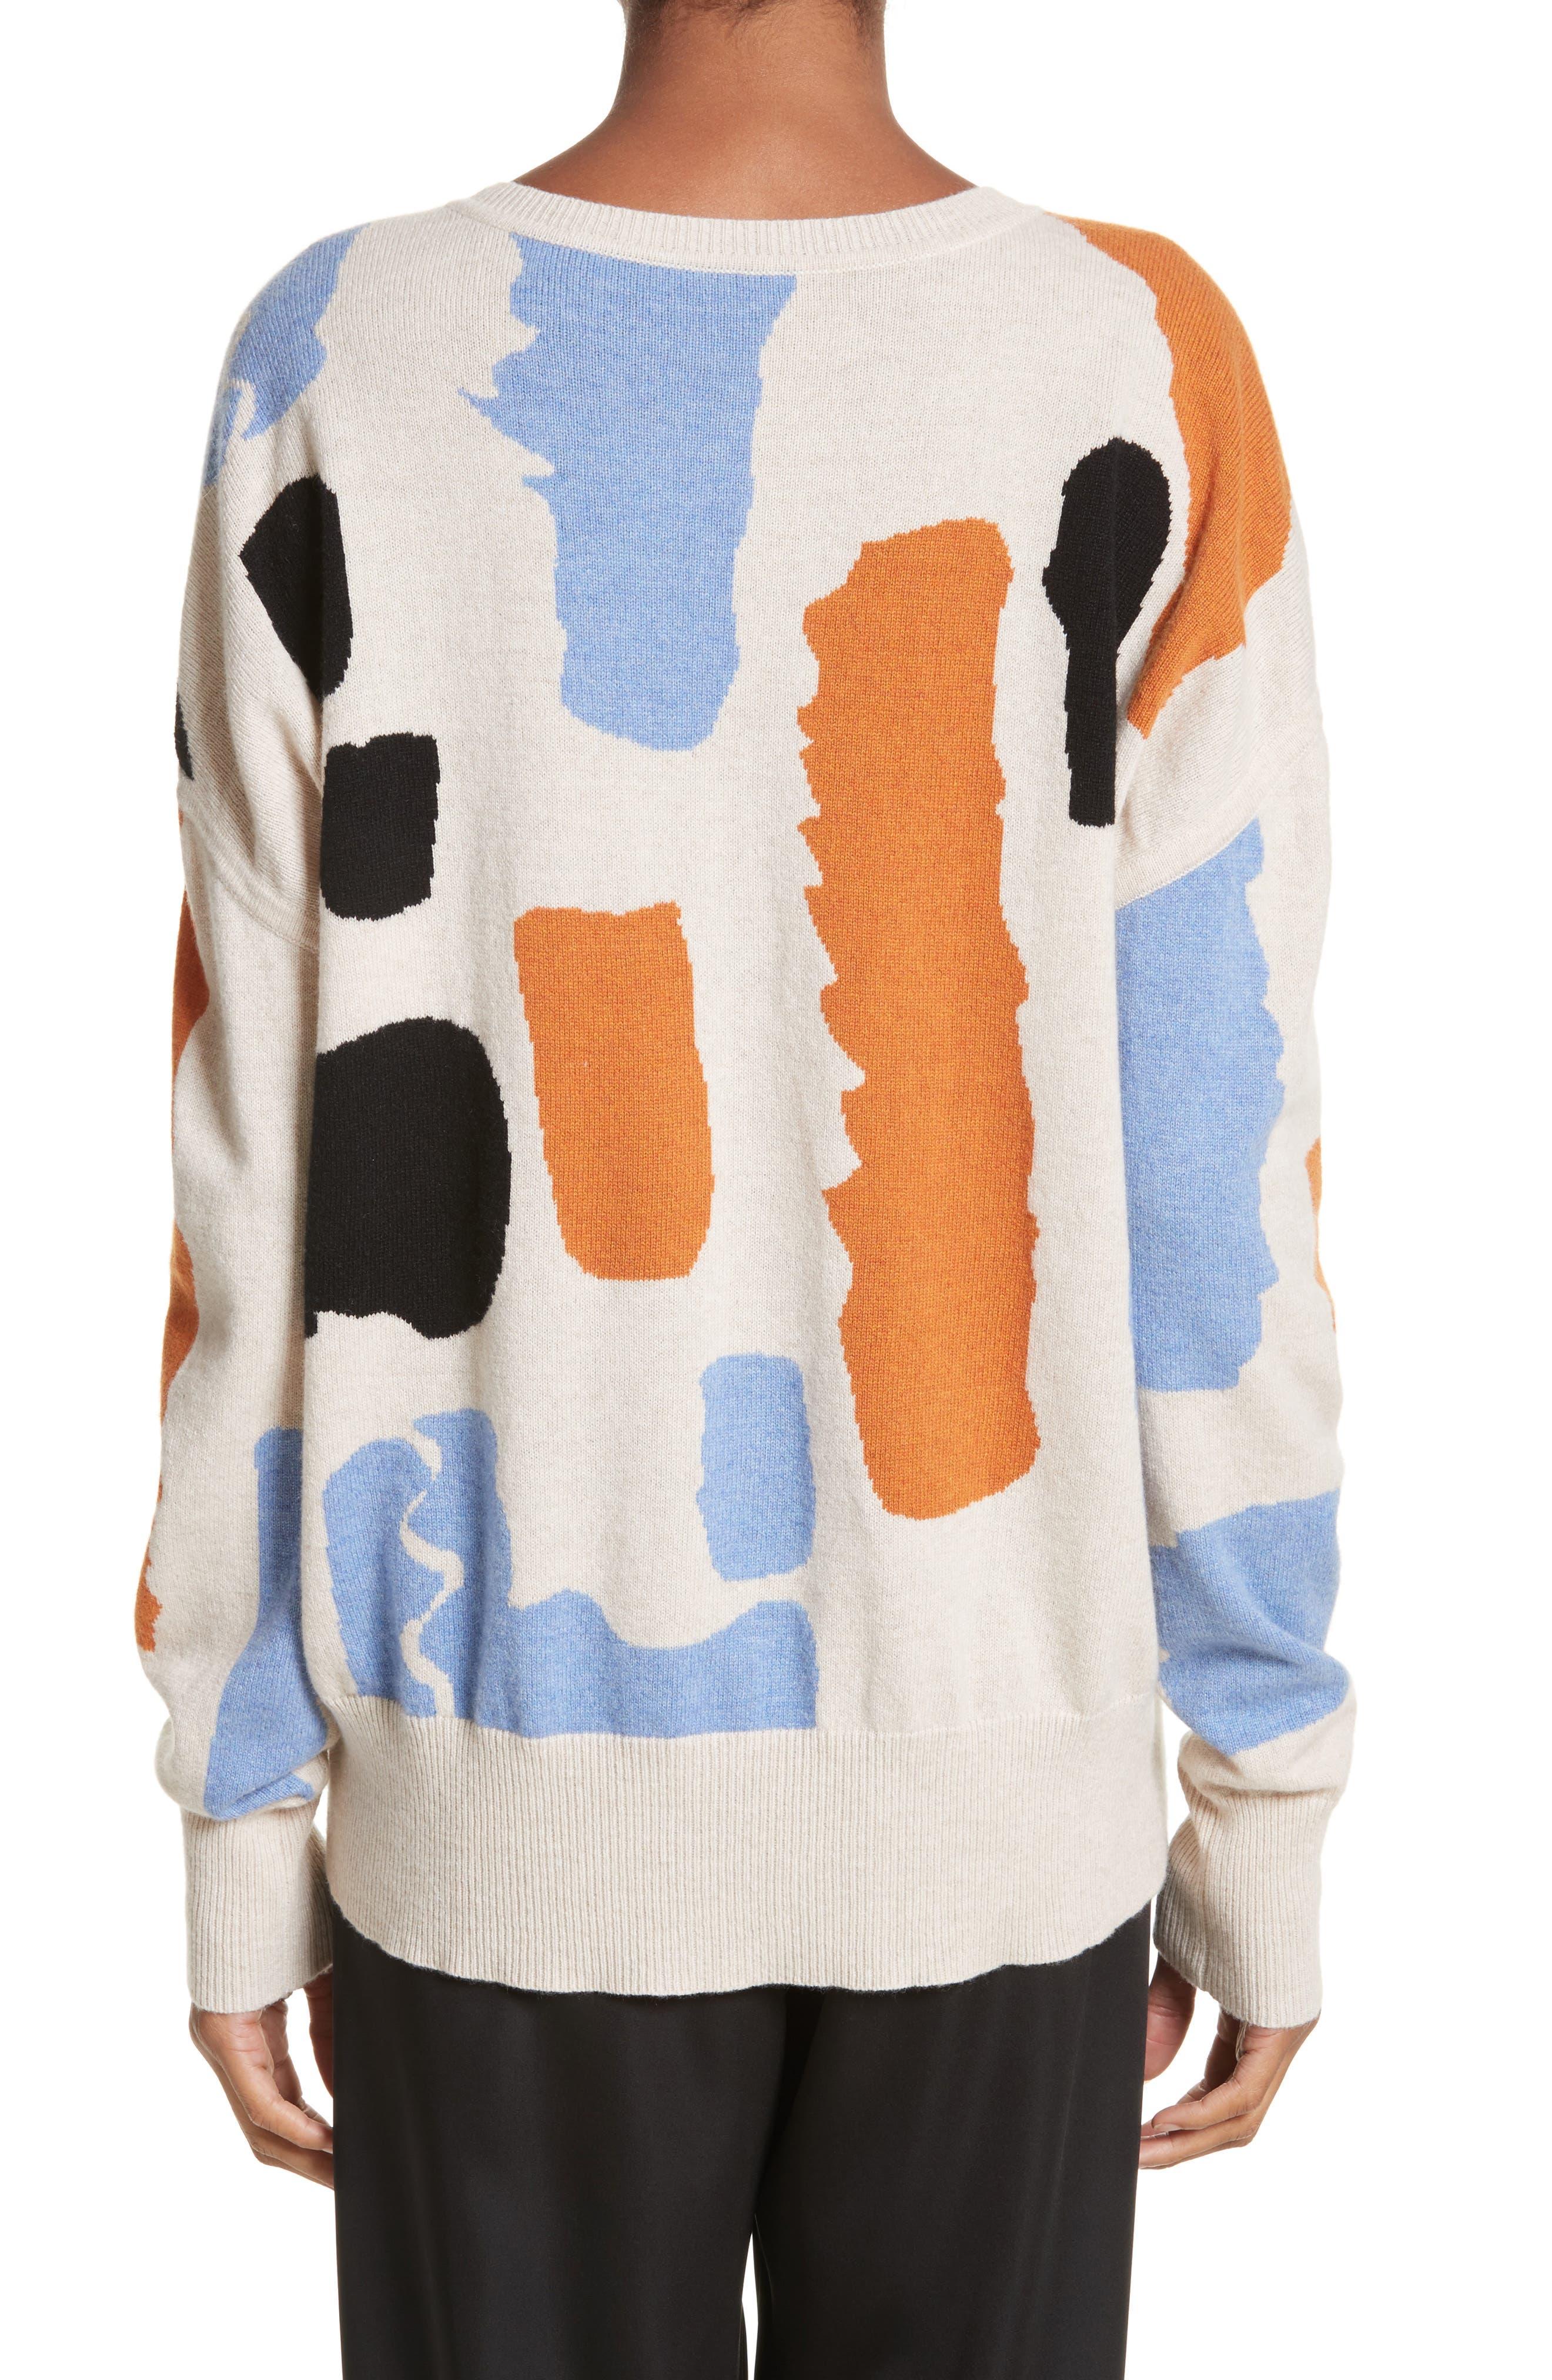 ZERO + MARIA CORNEJO,                             Palette Cashmere & Merino Wool Sweater,                             Alternate thumbnail 2, color,                             902